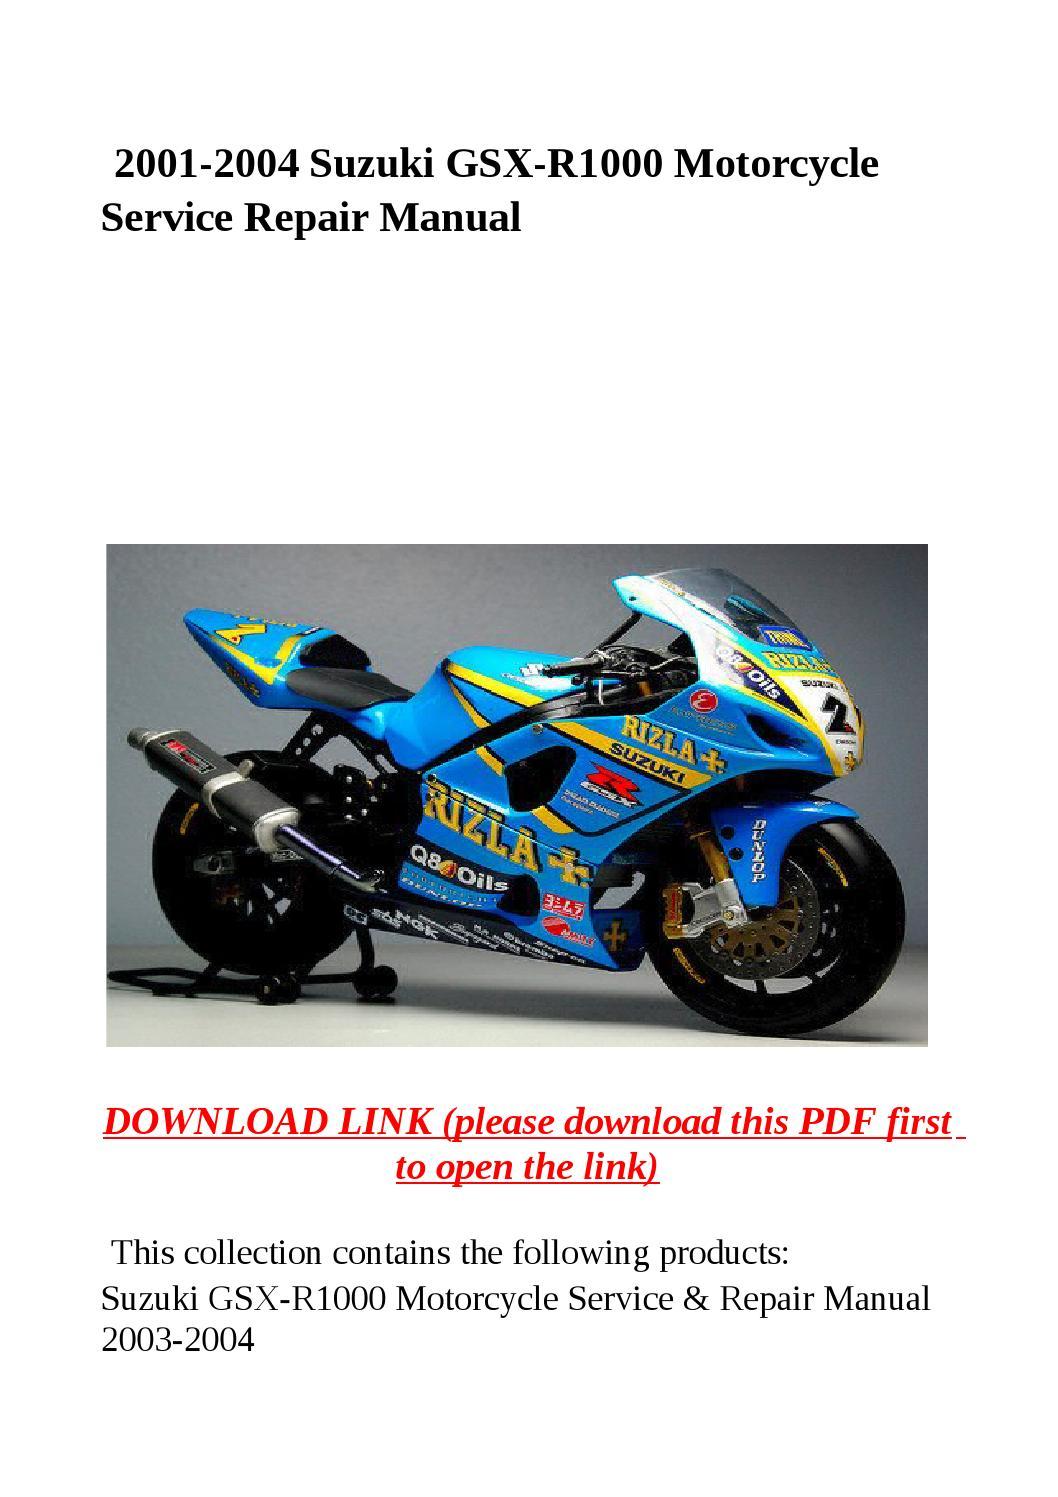 2001 2004 suzuki gsx r1000 motorcycle service repair manual by yghj - issuu